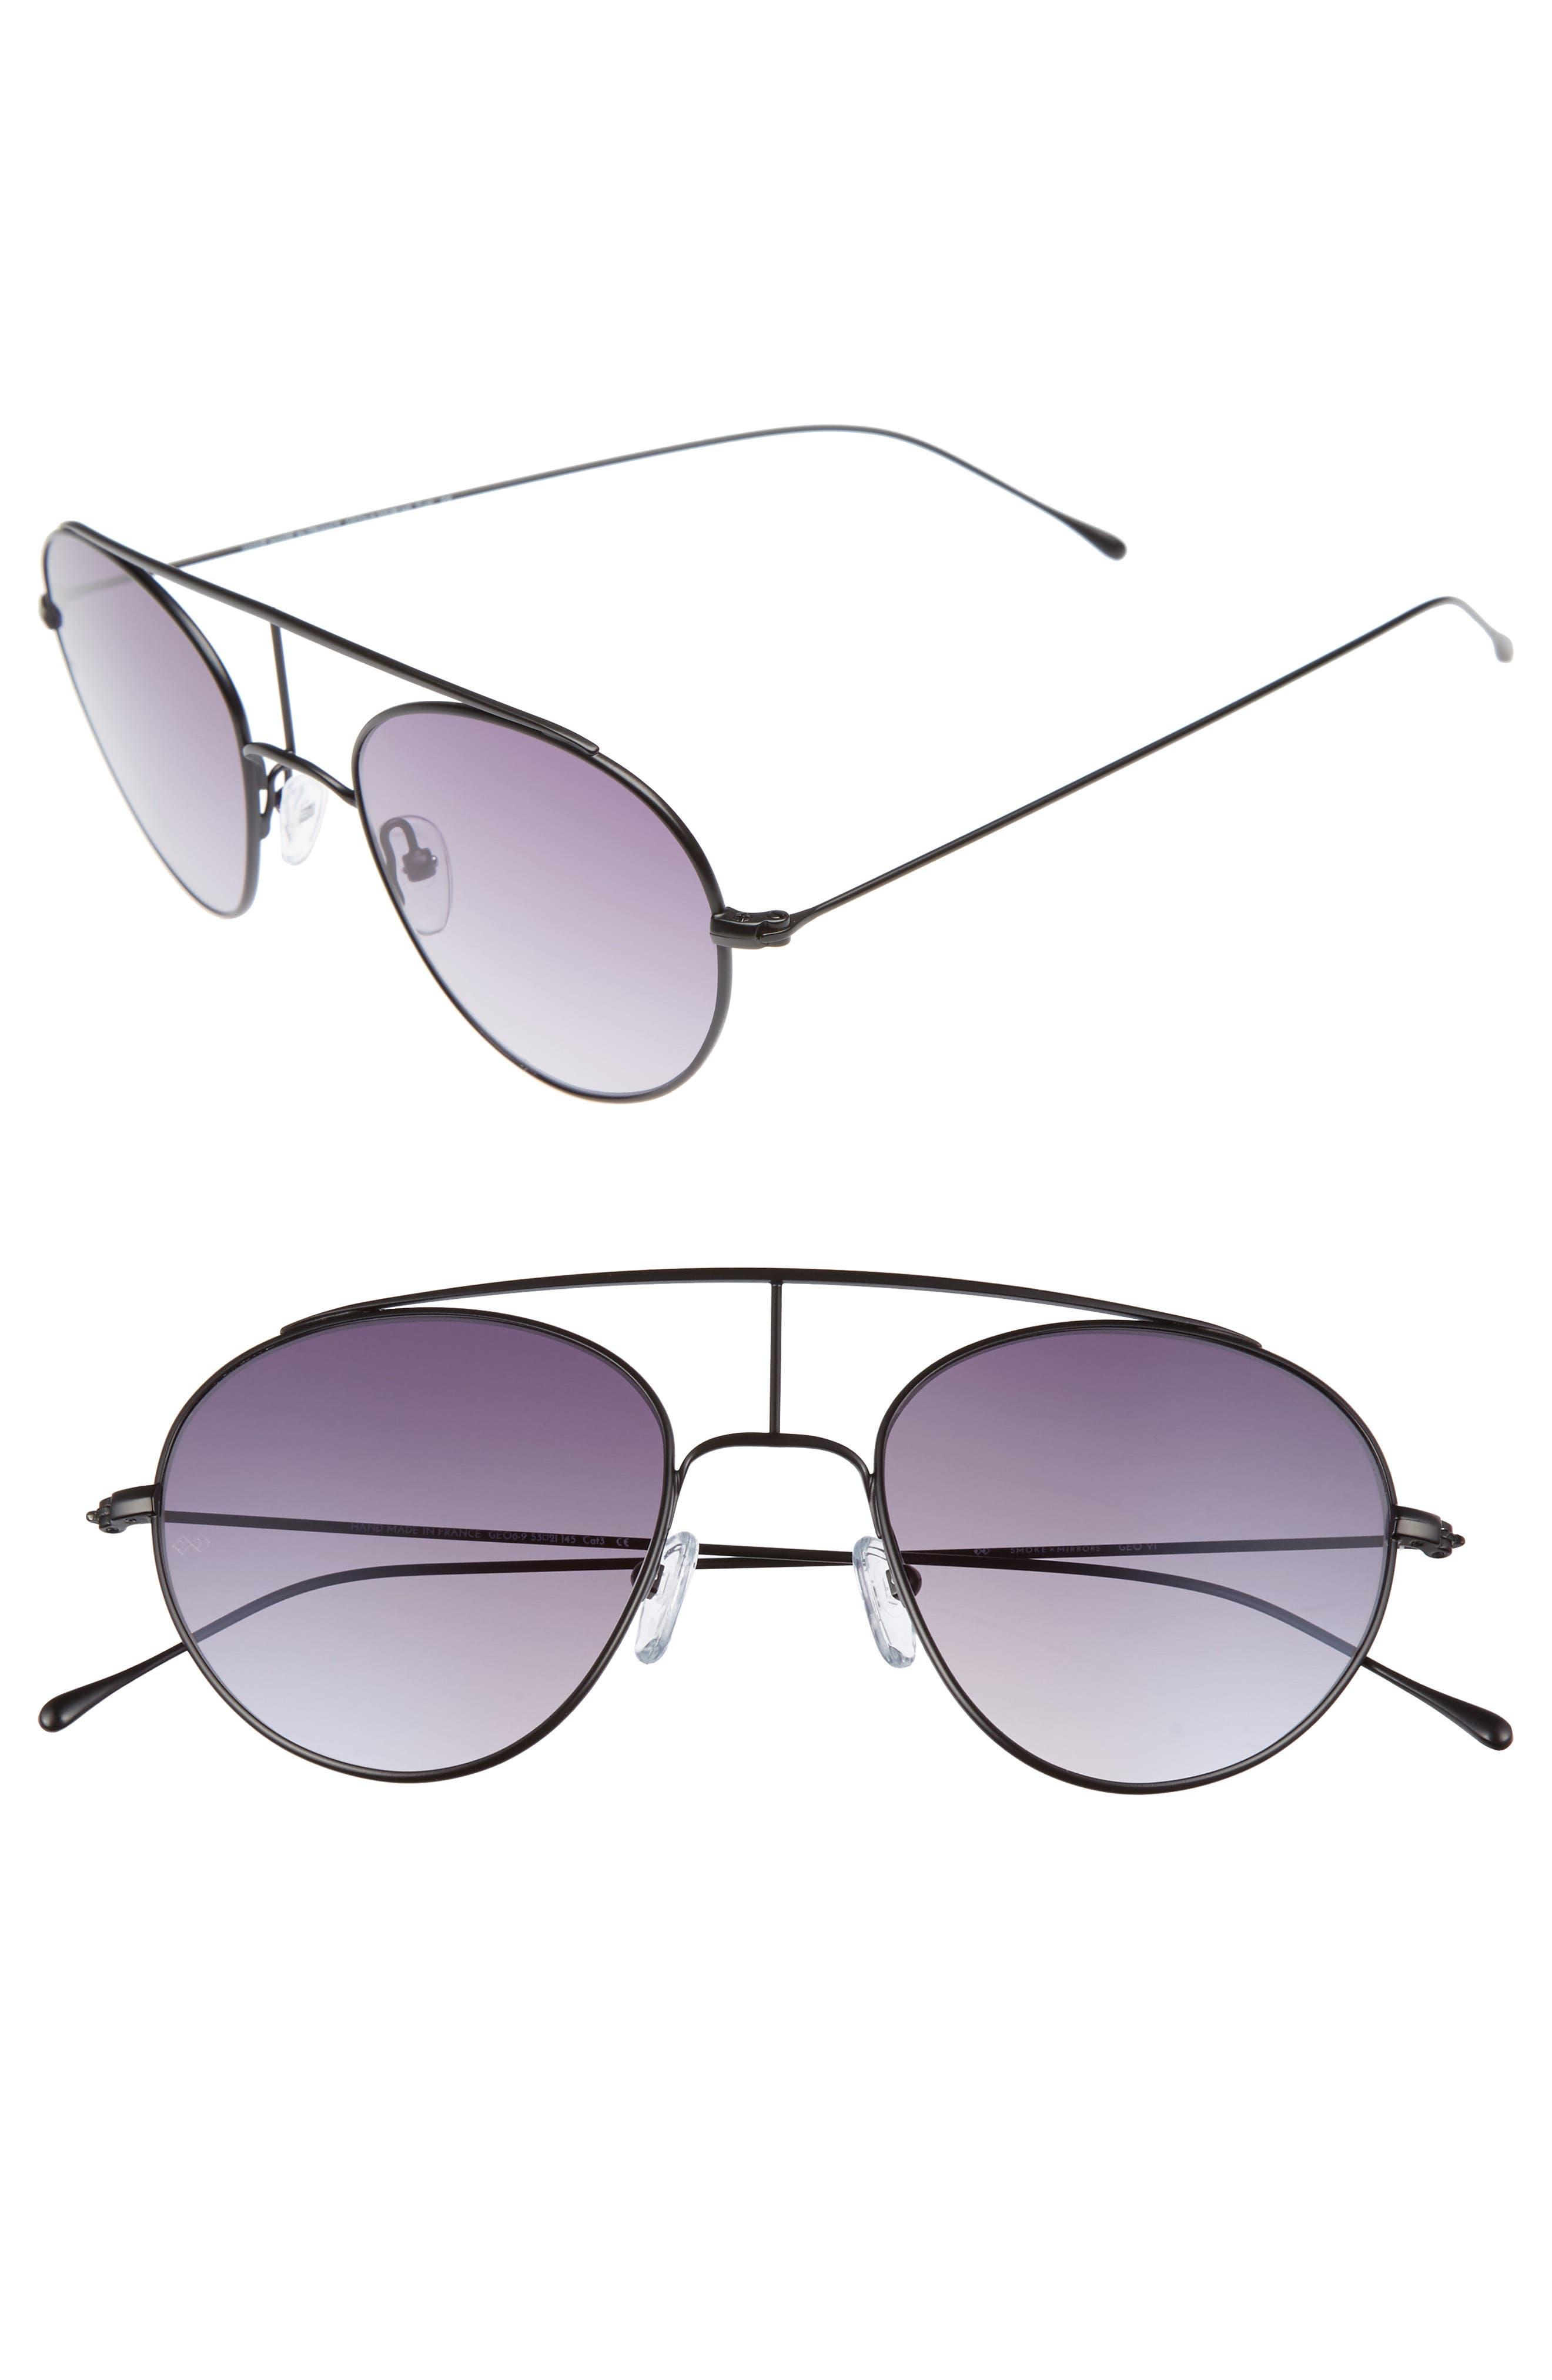 Geo 6 53mm Retro Sunglasses,                             Main thumbnail 1, color,                             001